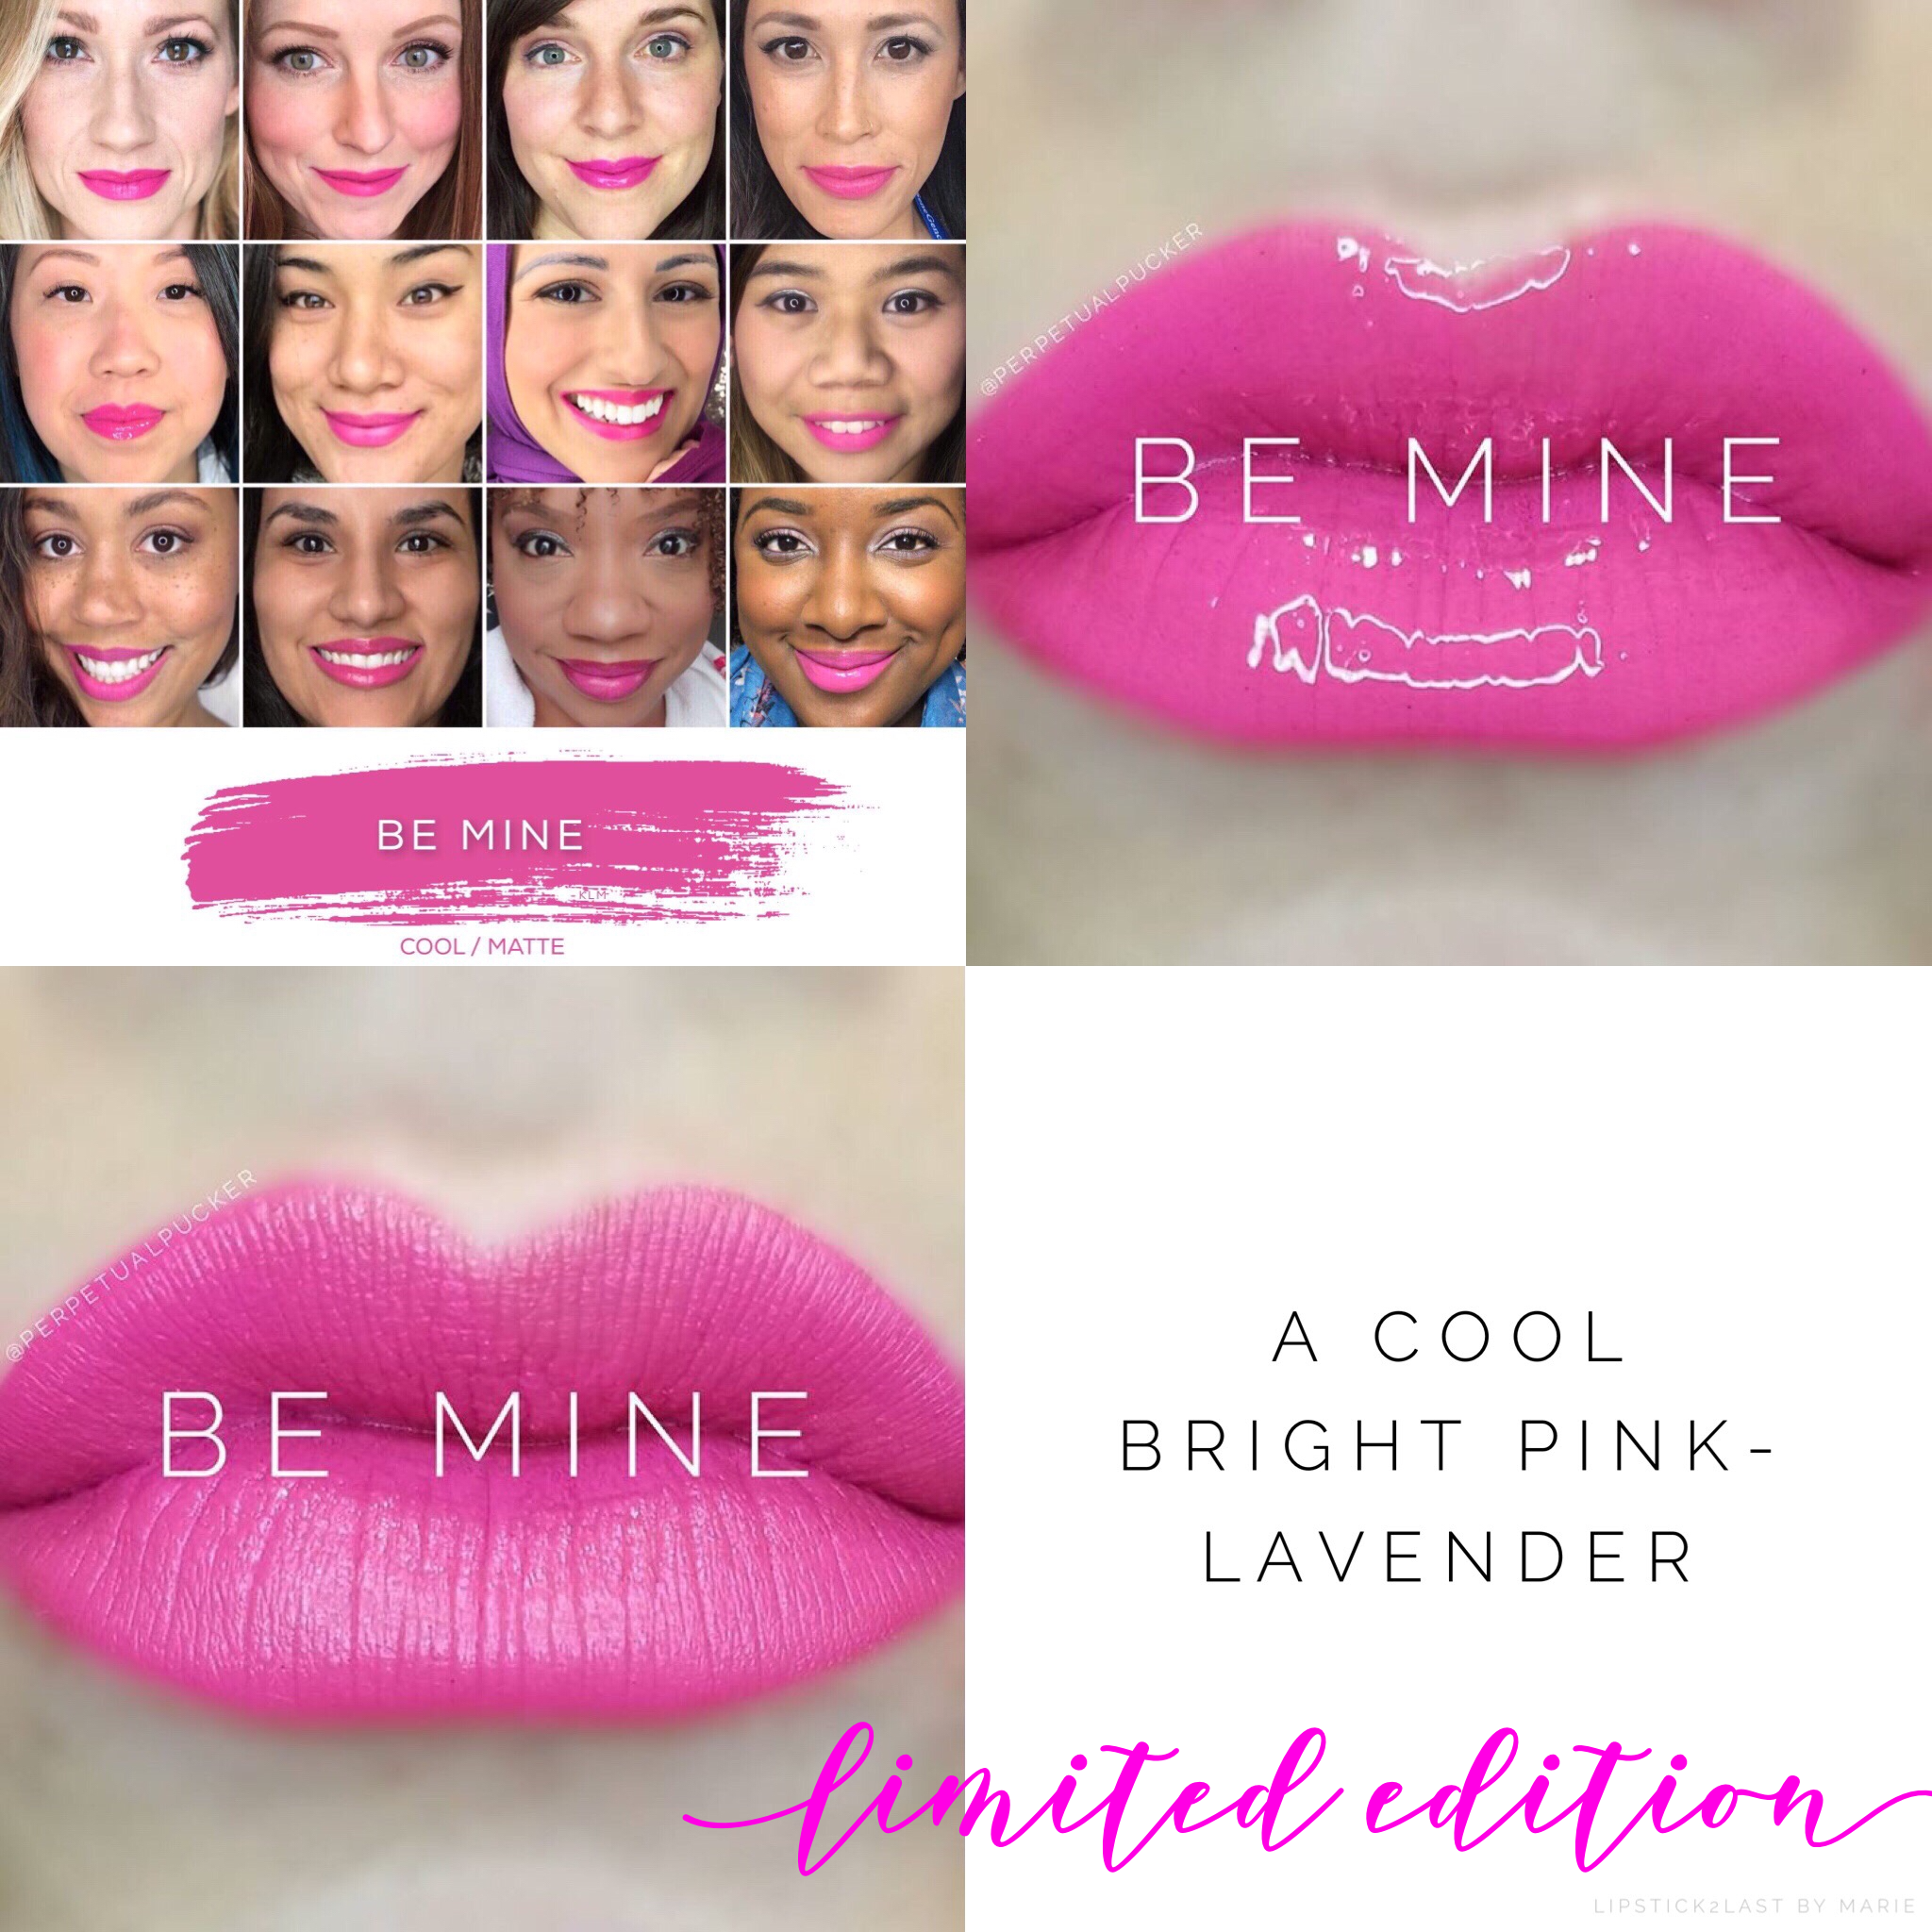 Be Mine LipSense Limited Edition collage